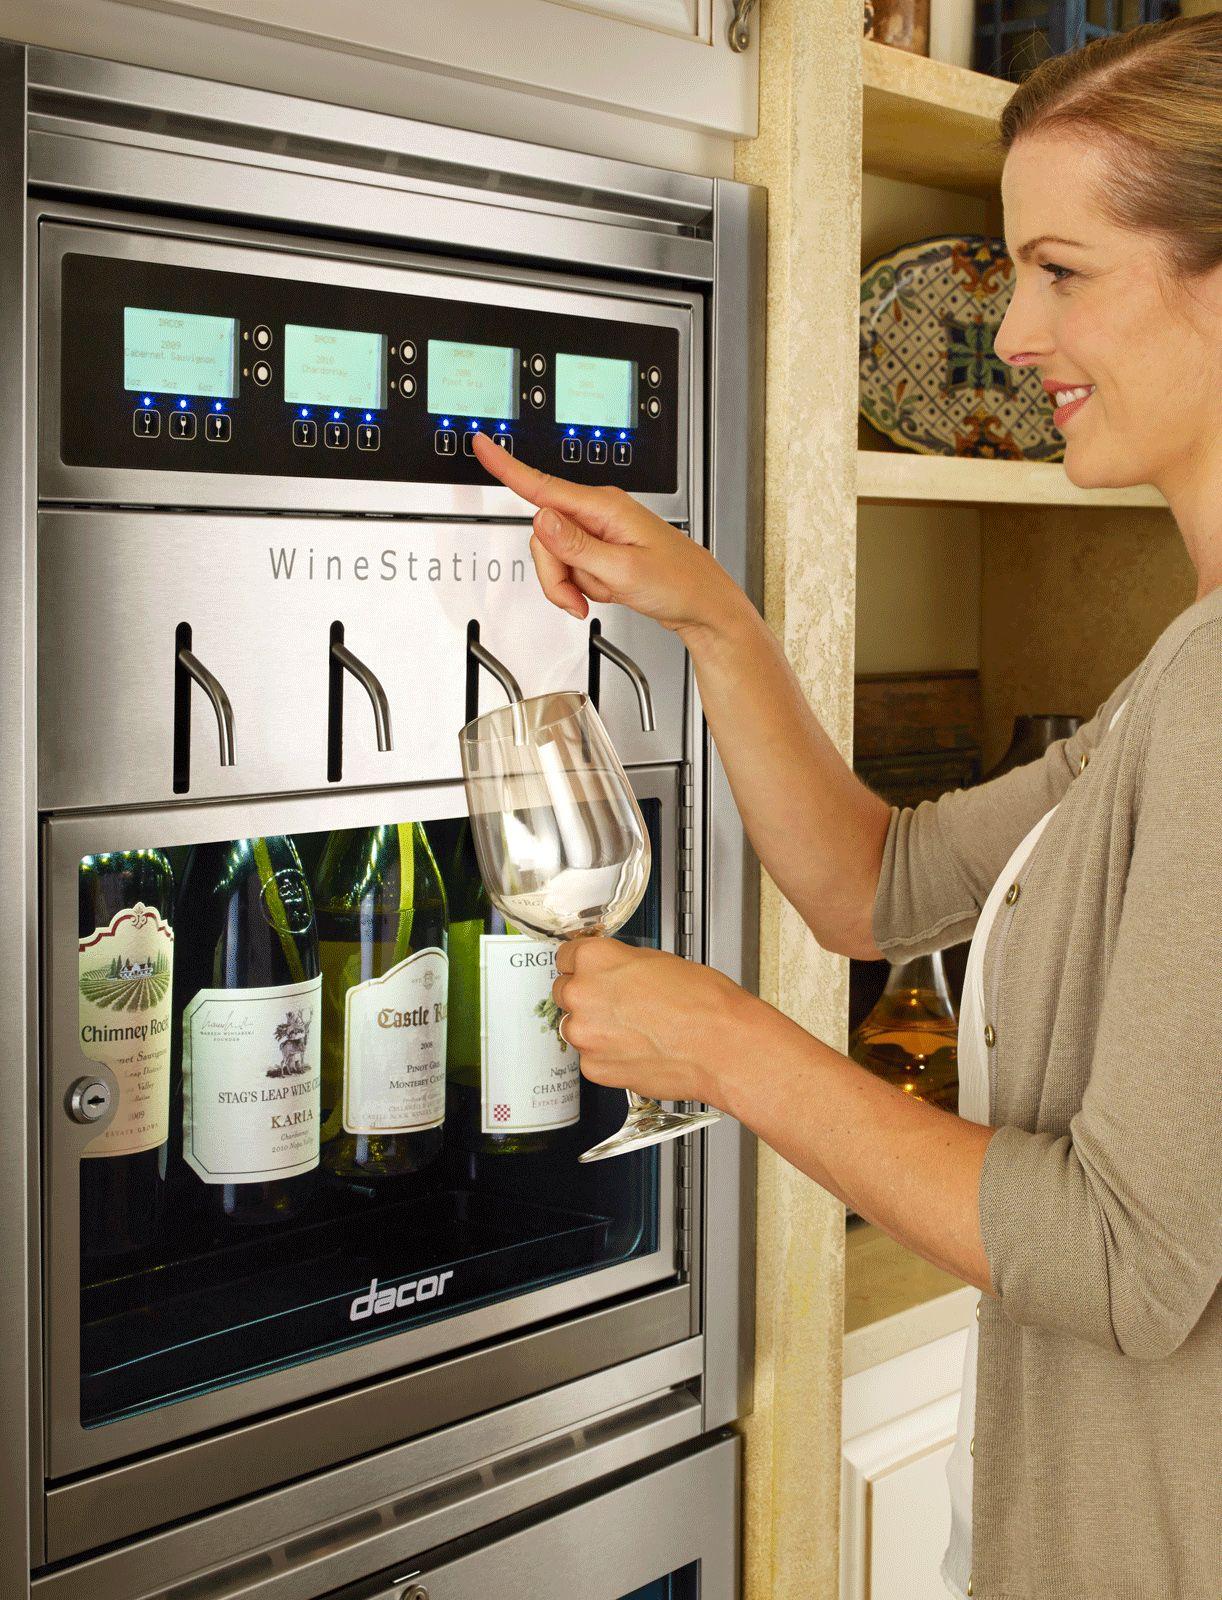 10 Best Kitchen Appliances to Get Now Cool kitchens